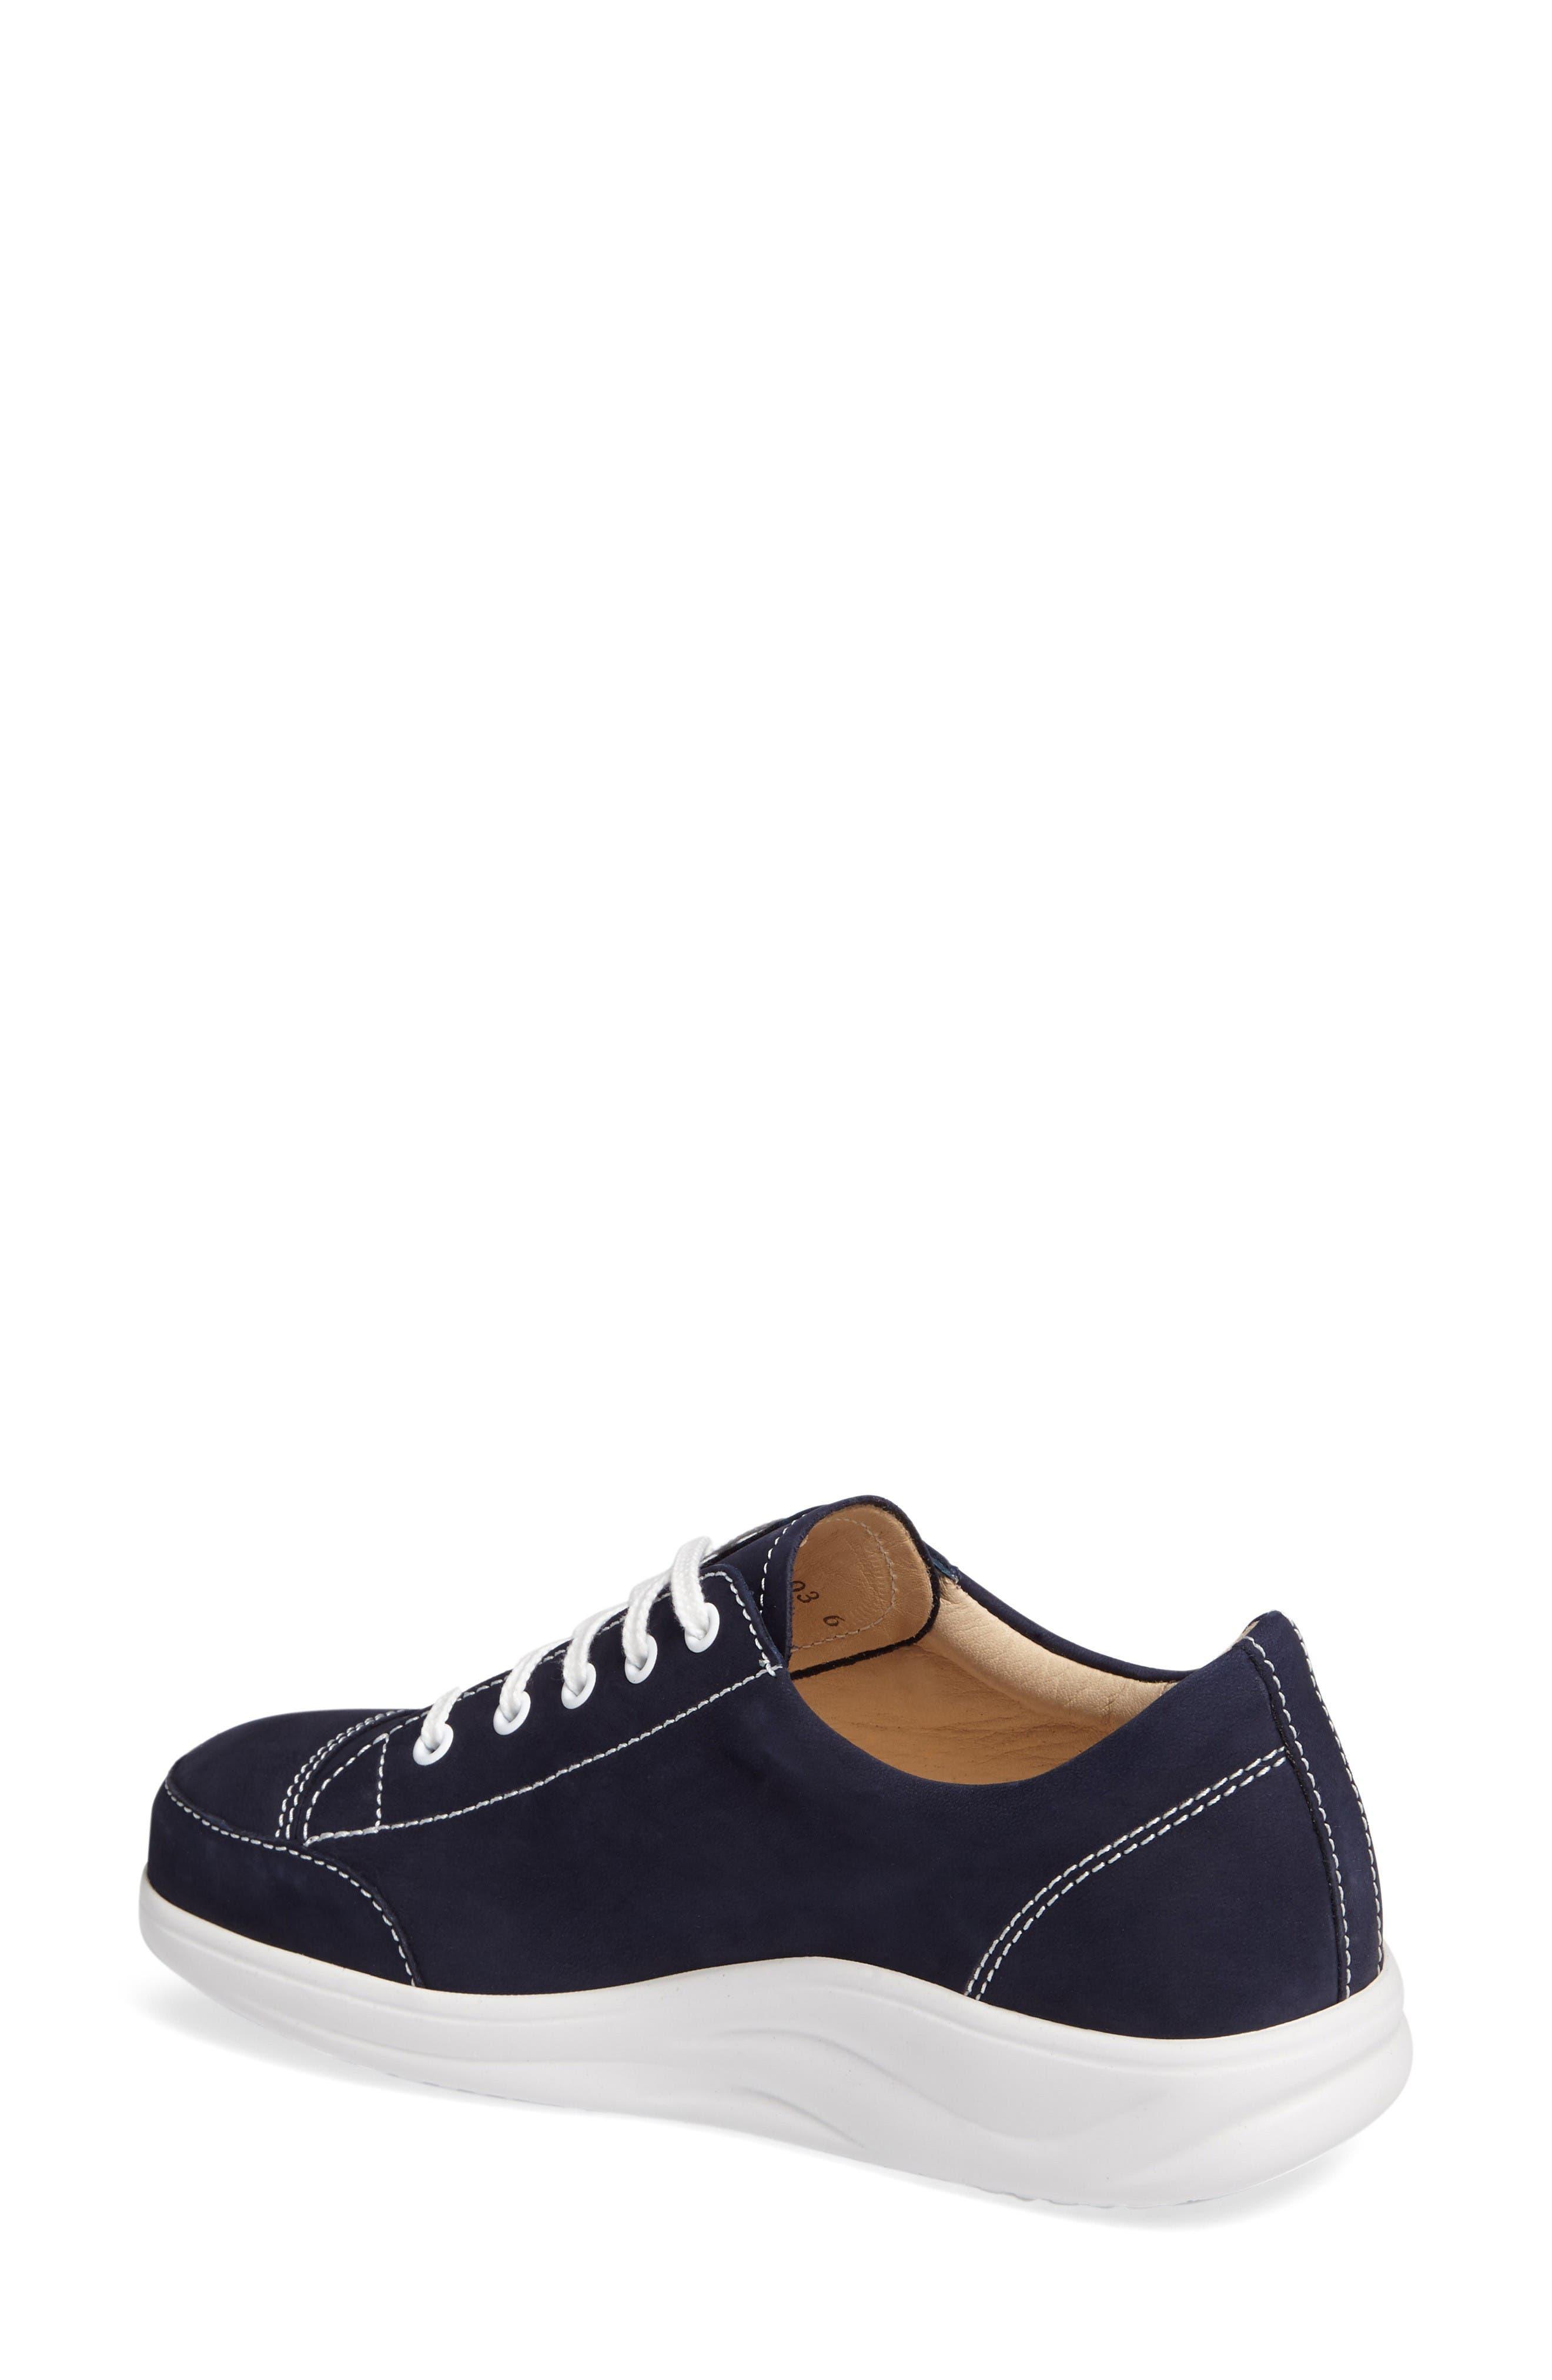 FINNAMIC by Finn Comfort 'Ikebukuro' Walking Shoe,                             Alternate thumbnail 2, color,                             Atlantic Leather